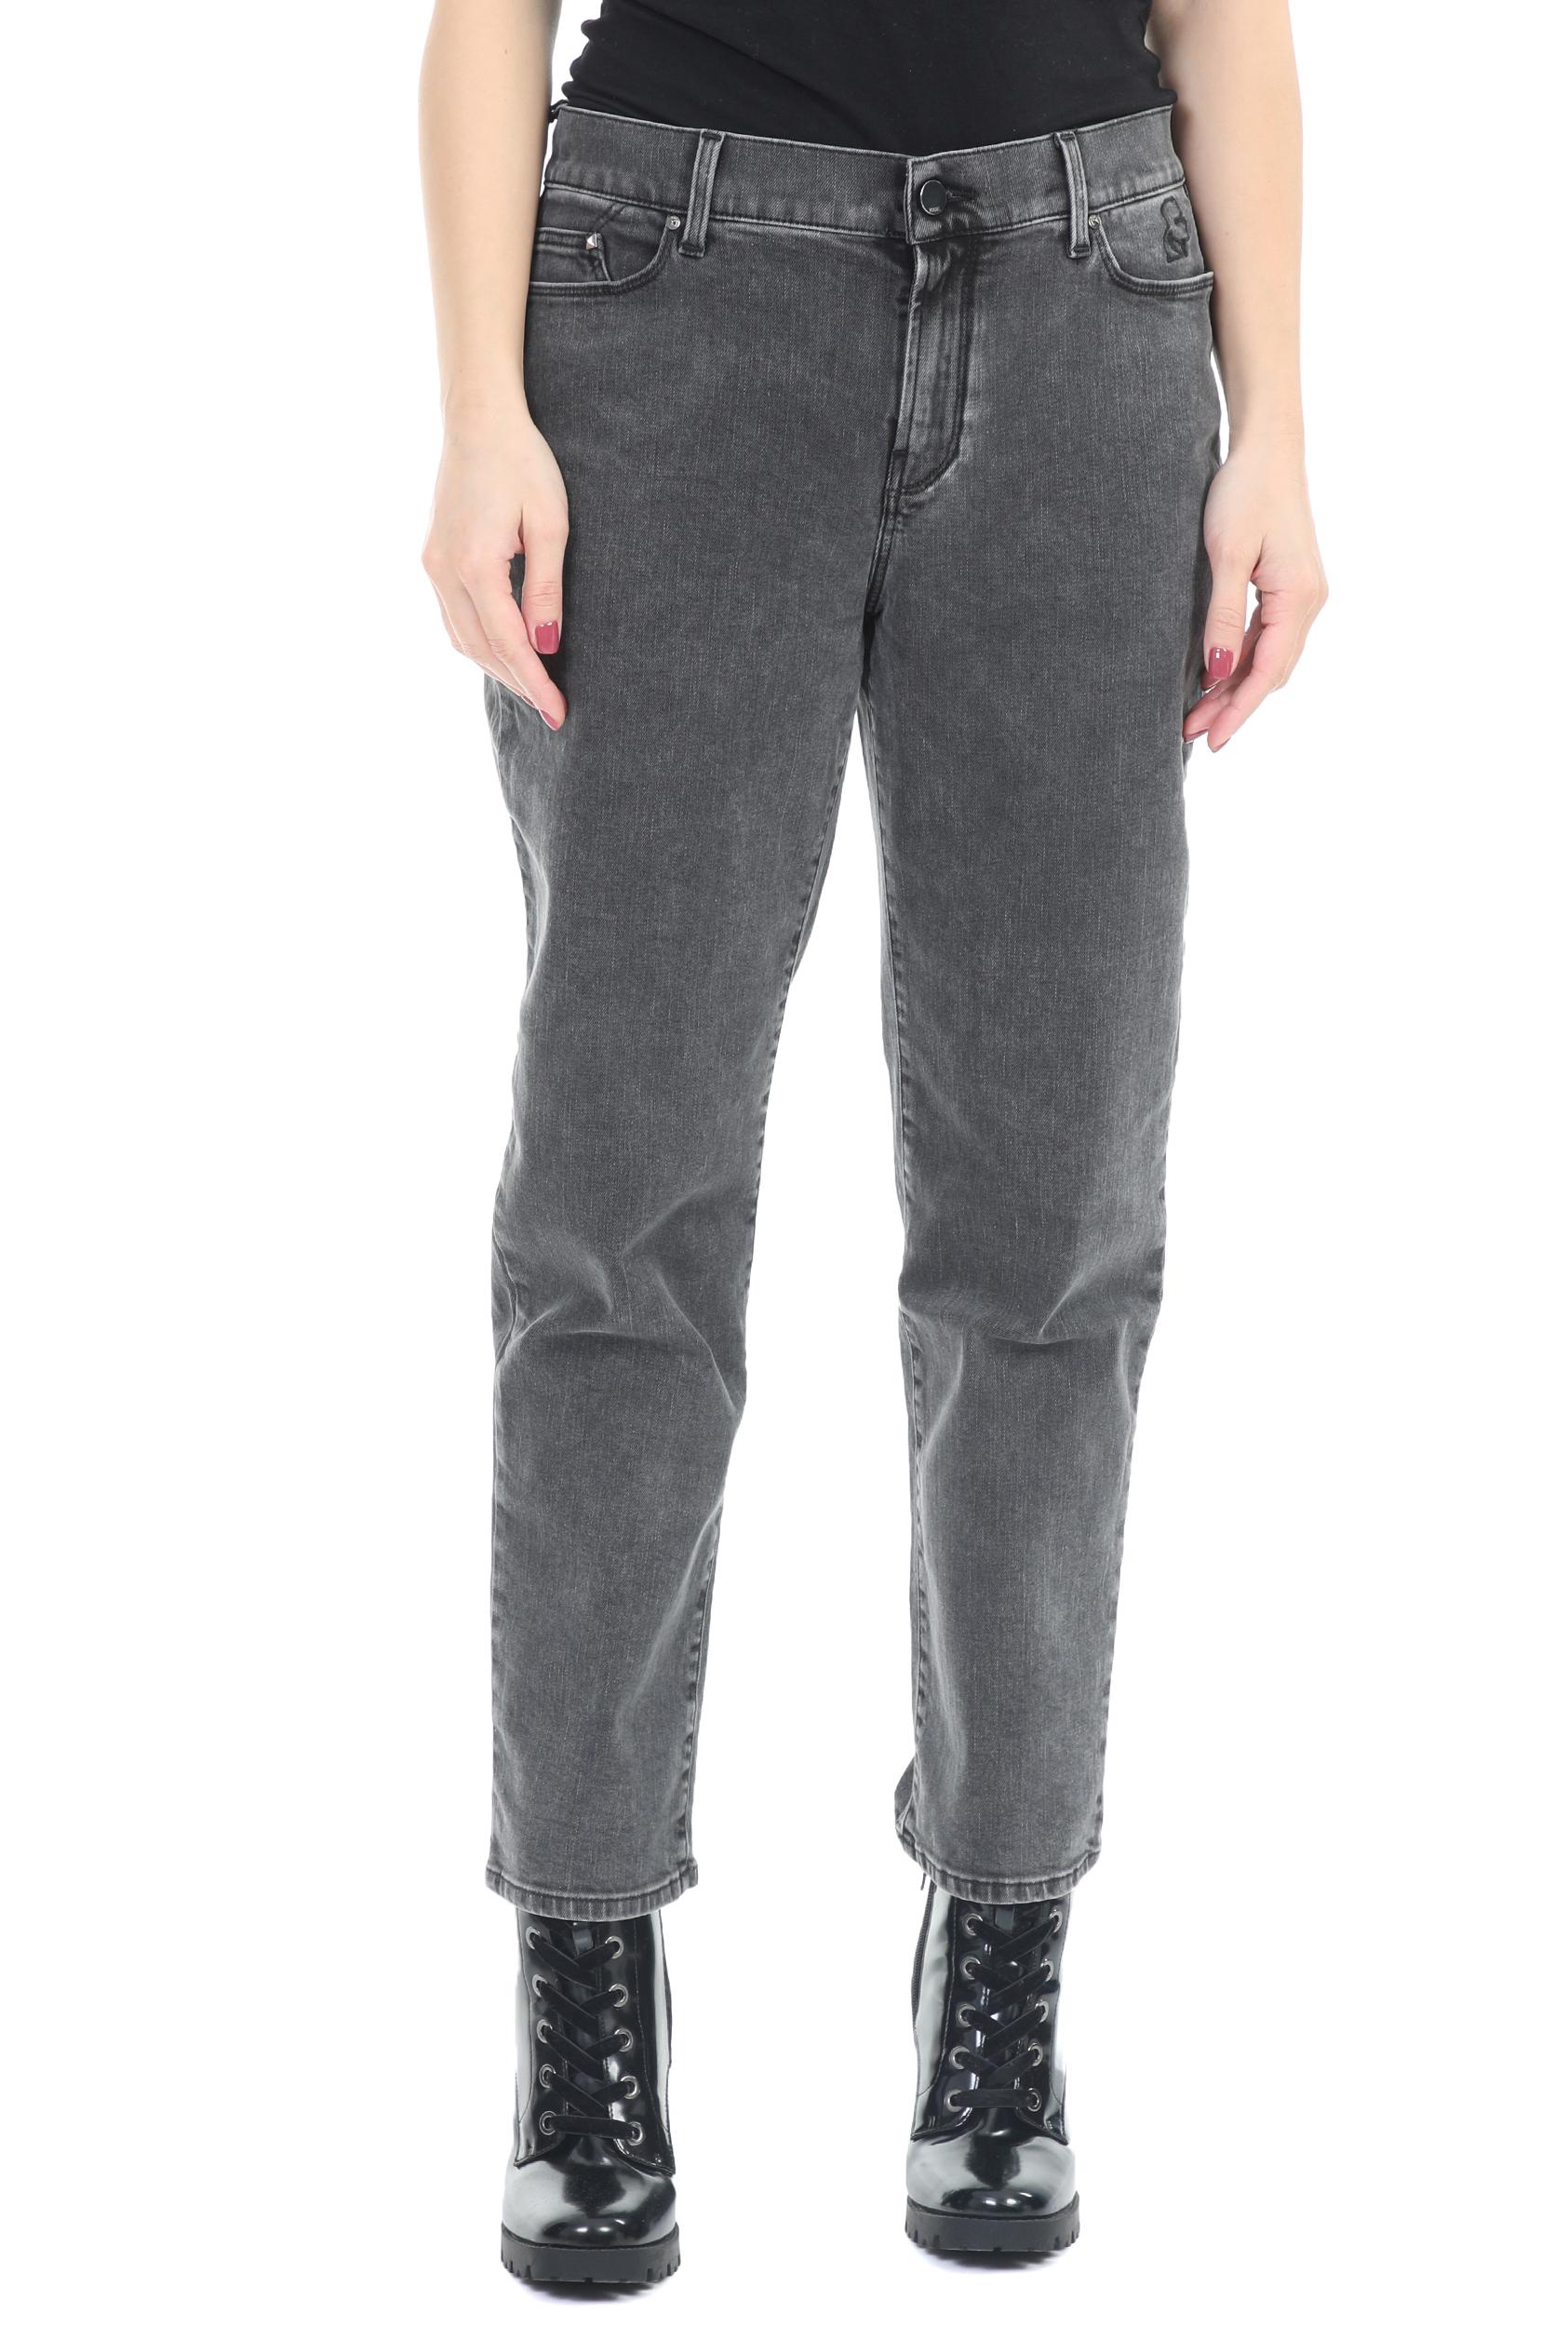 KARL LAGERFELD - Γυναικείο τζιν παντελόνι KARL LAGERFELD σκούρο γκρι